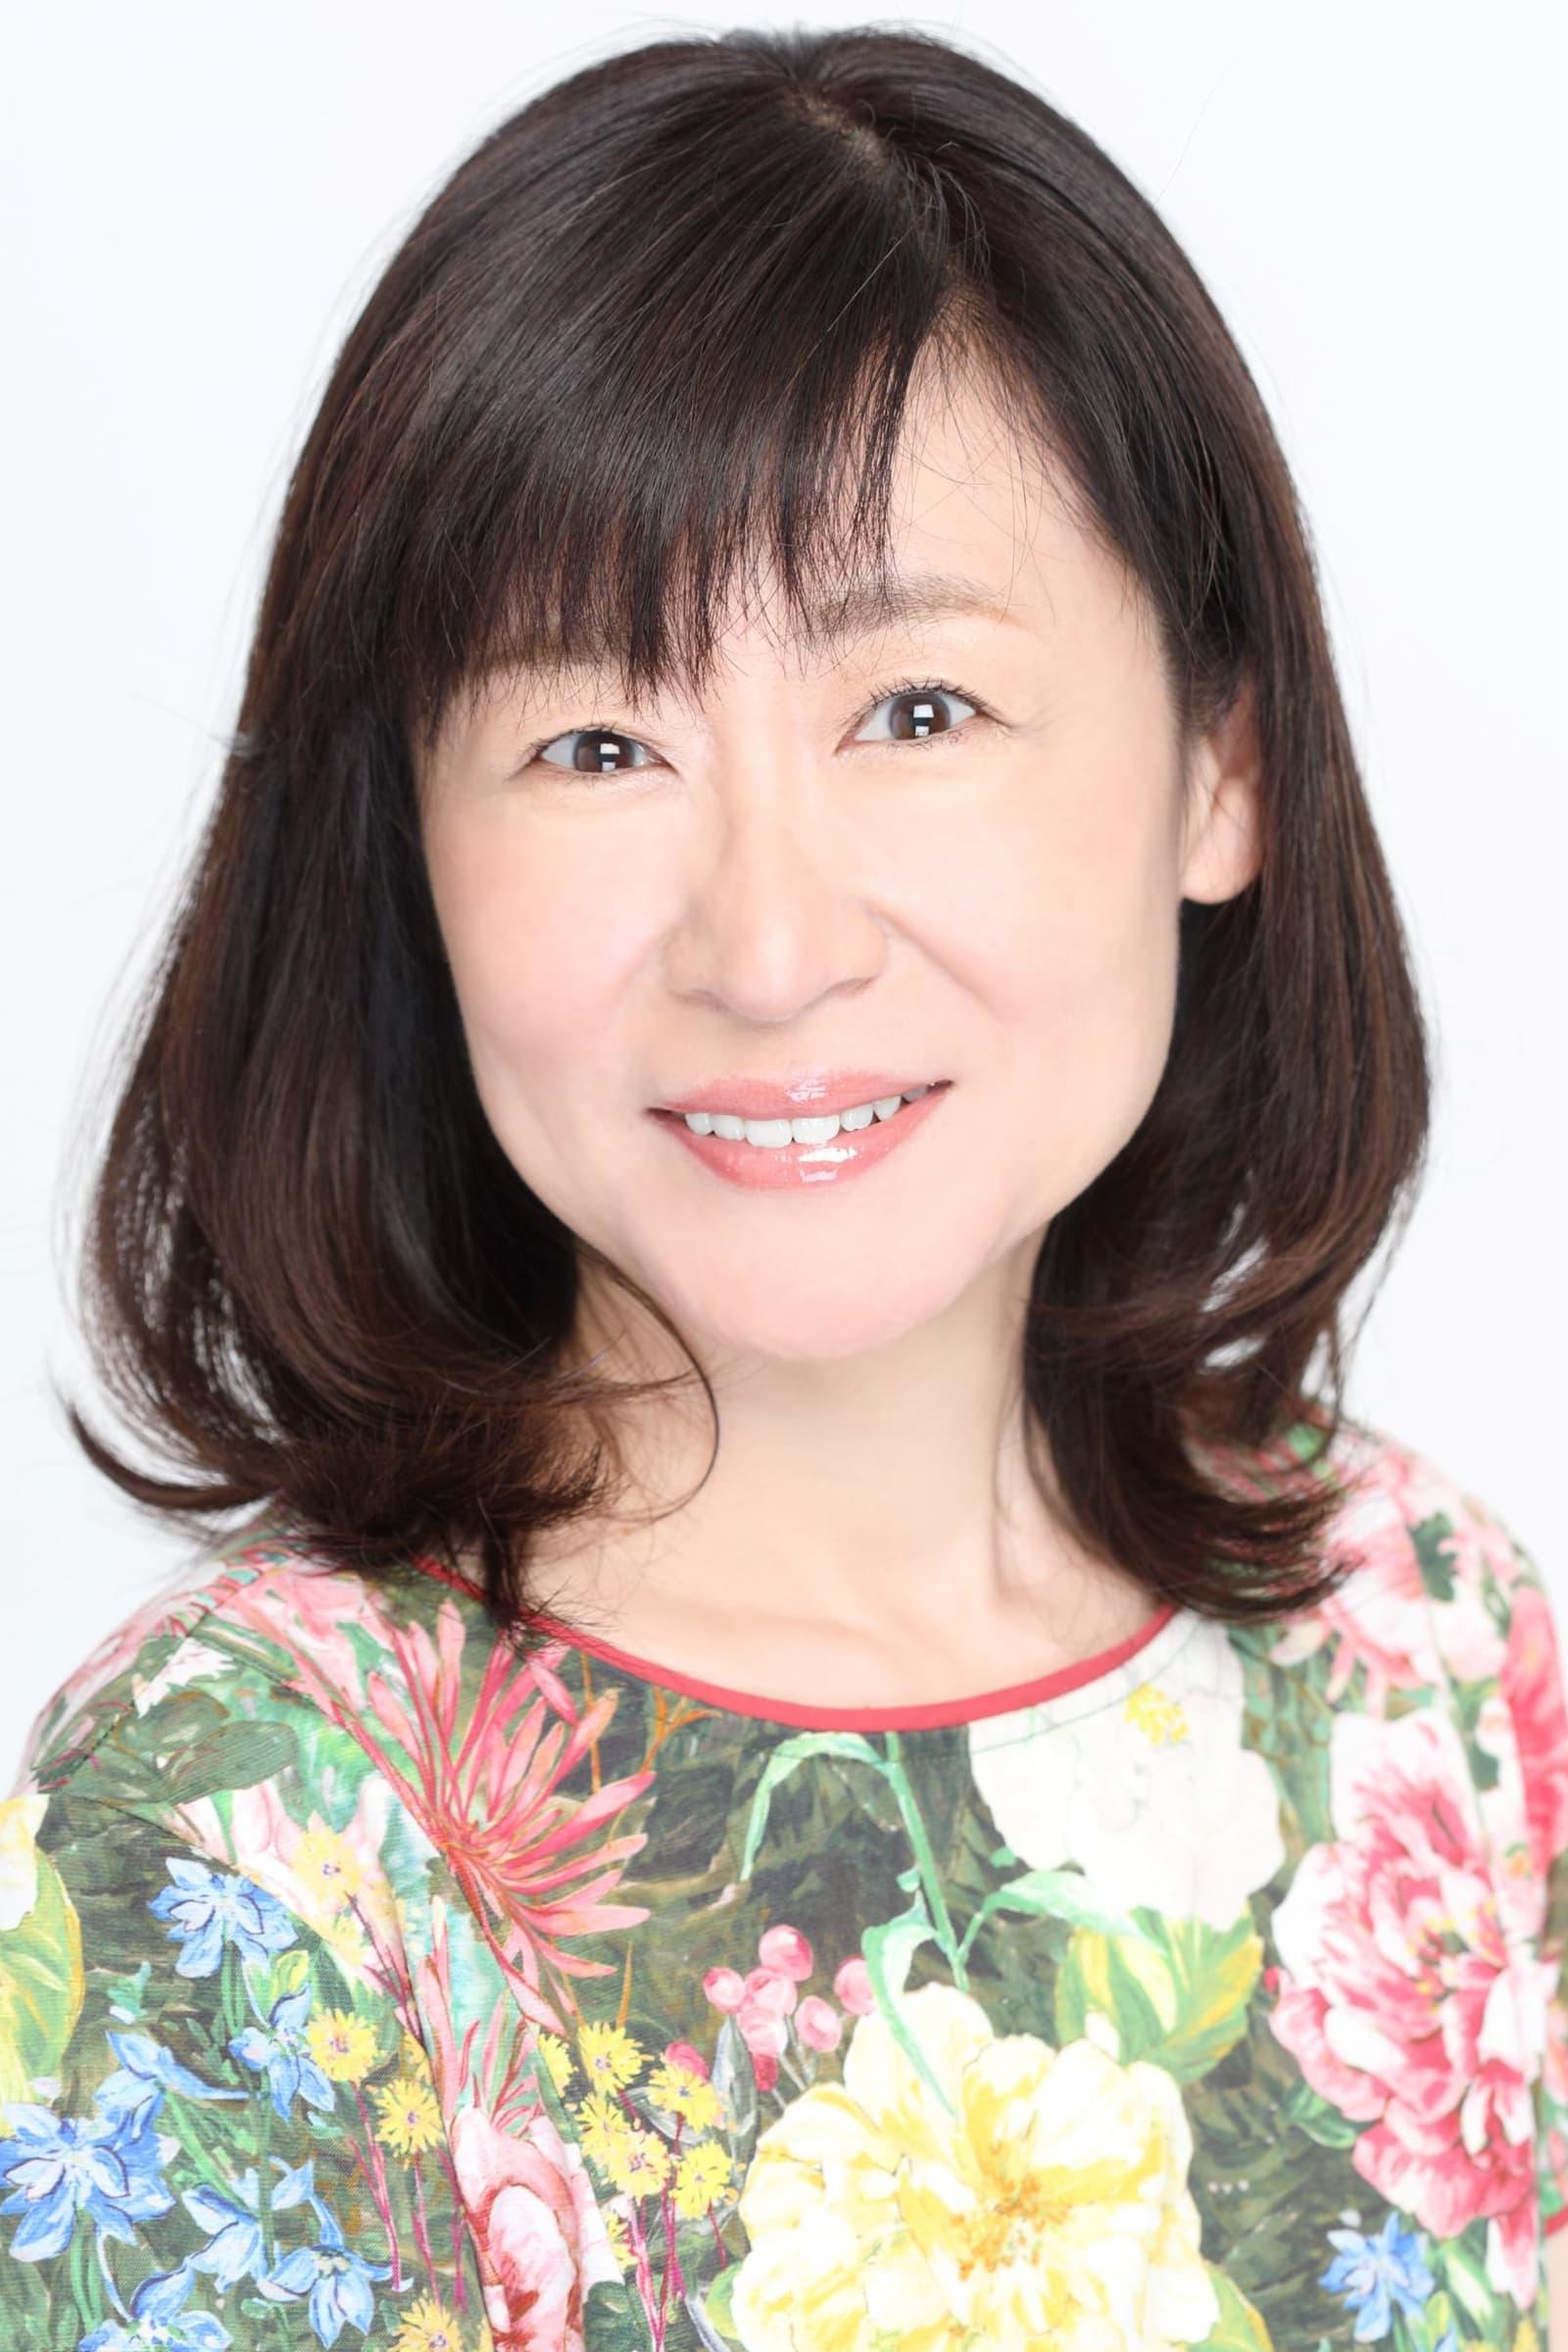 Yūko Sumitomo